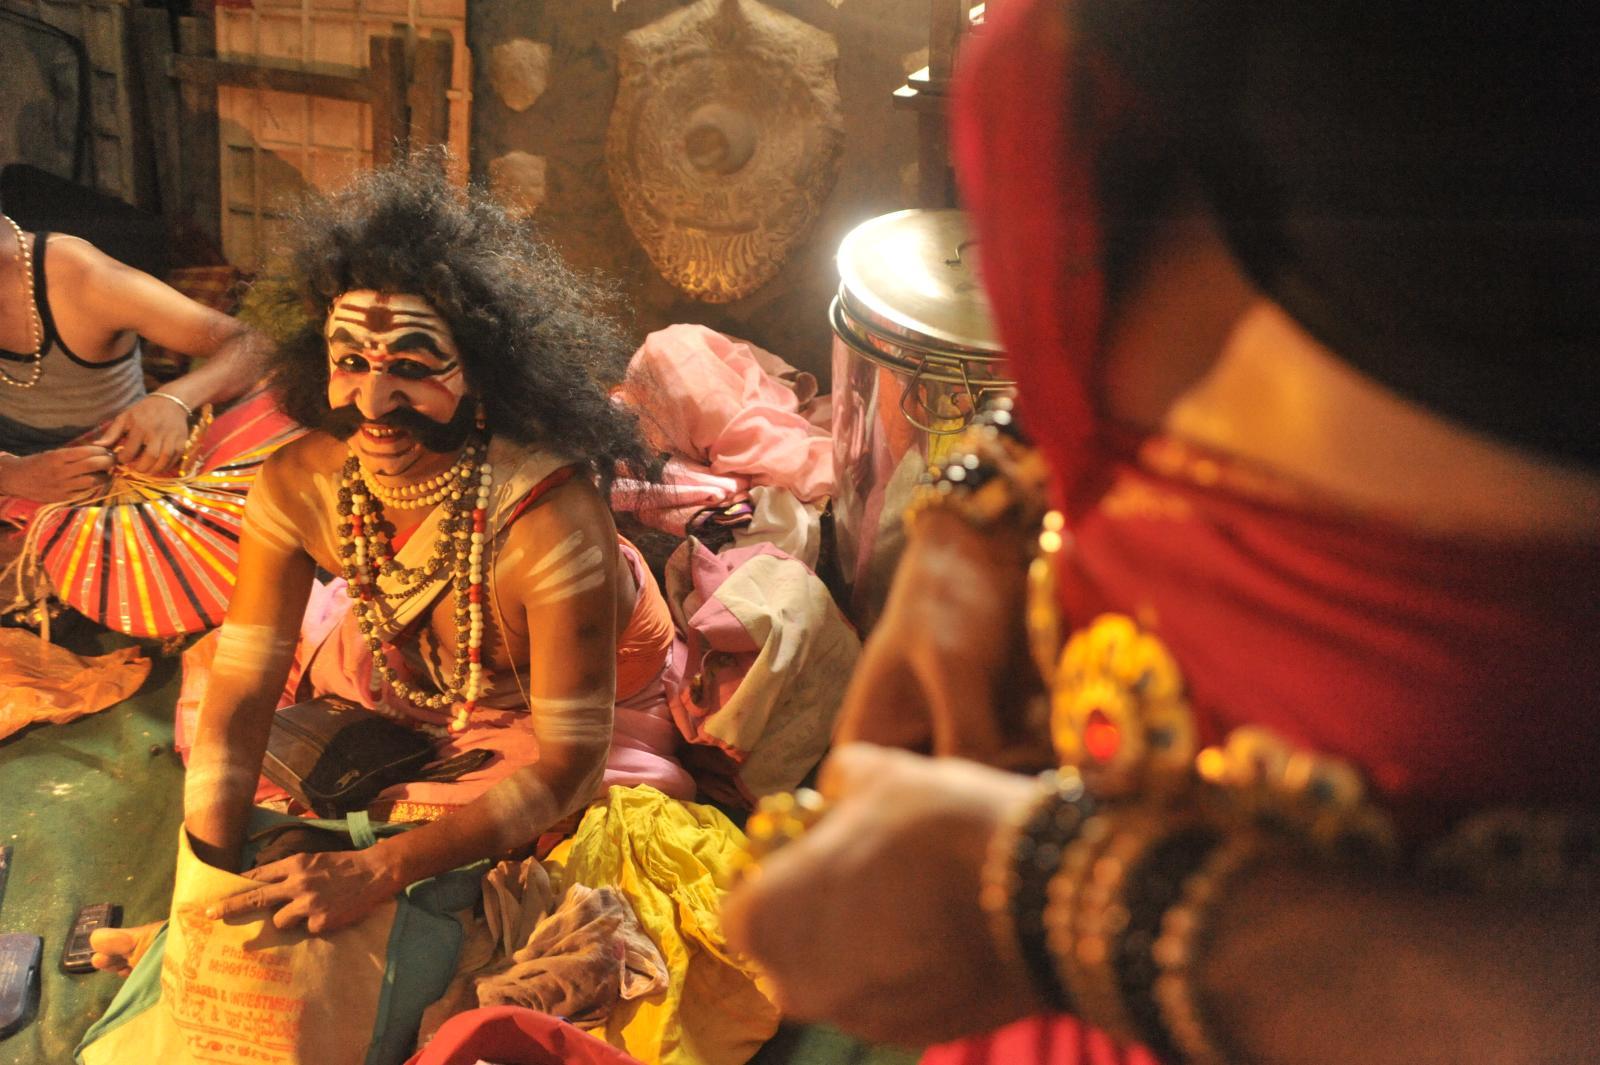 Bhima, ready, beyond belief! Yakshagana, Kichaka Vadha